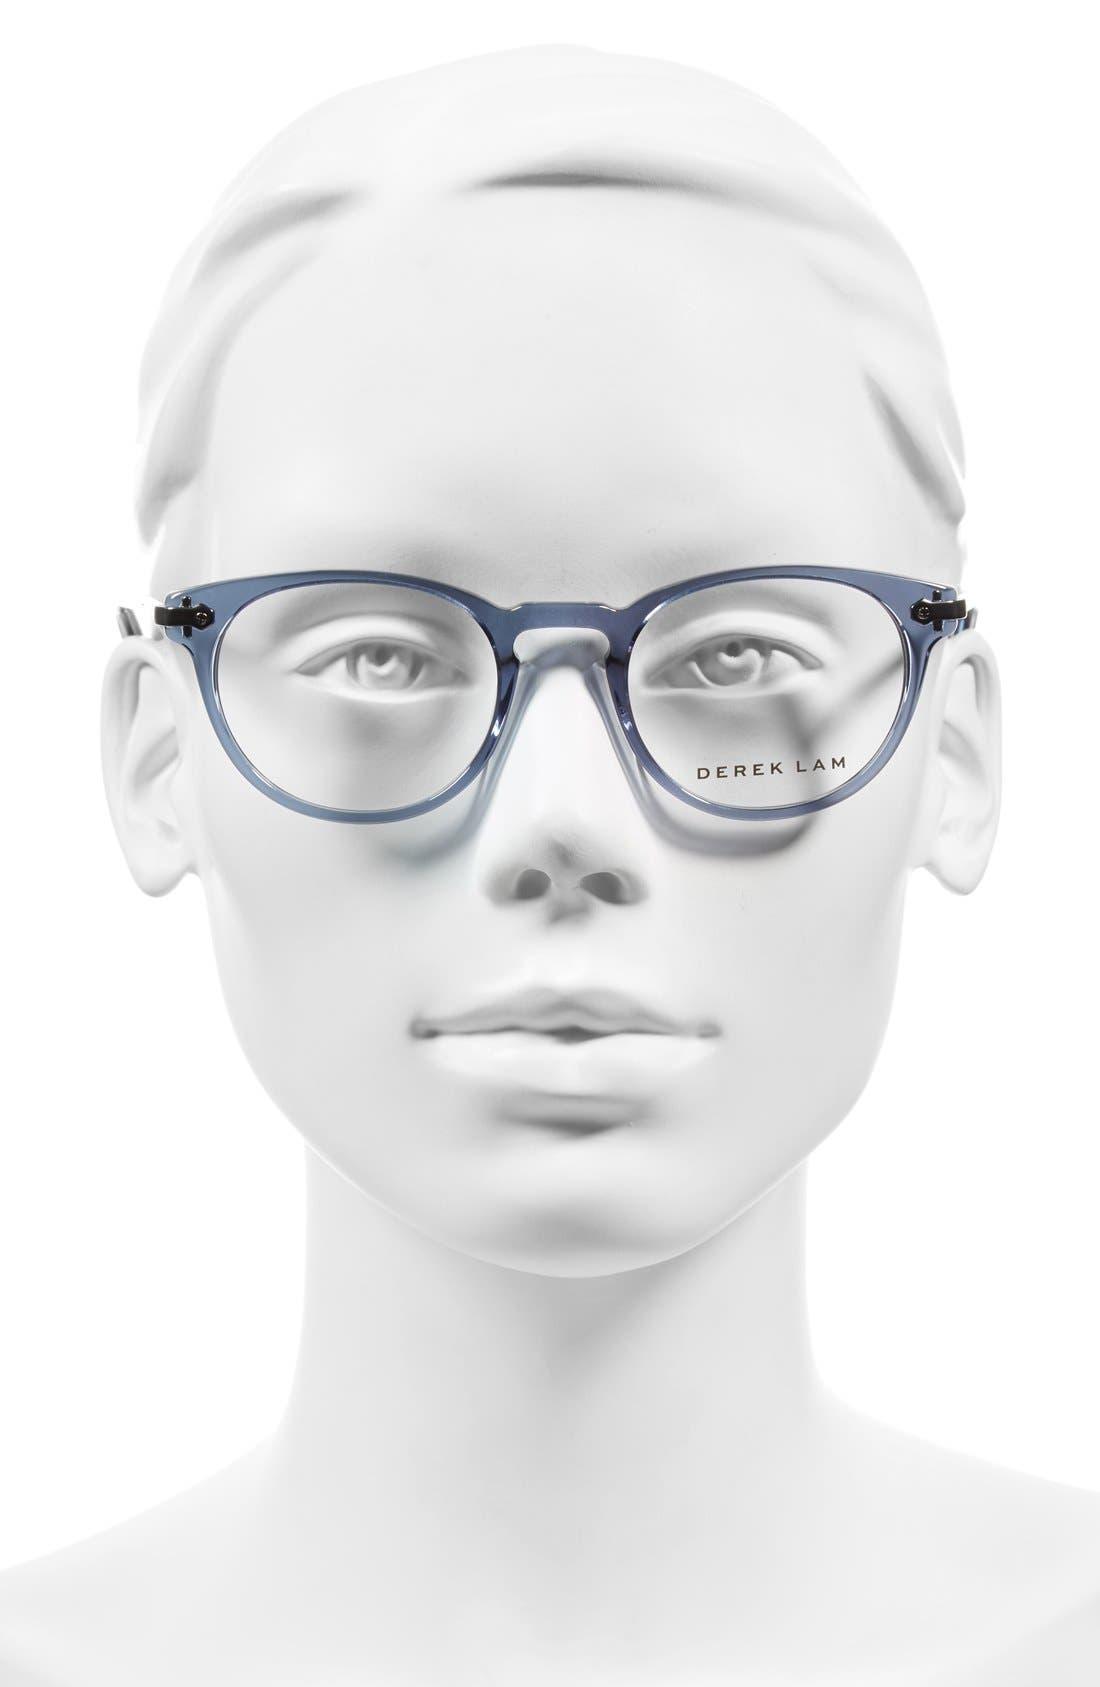 48mm Optical Glasses,                             Alternate thumbnail 2, color,                             020